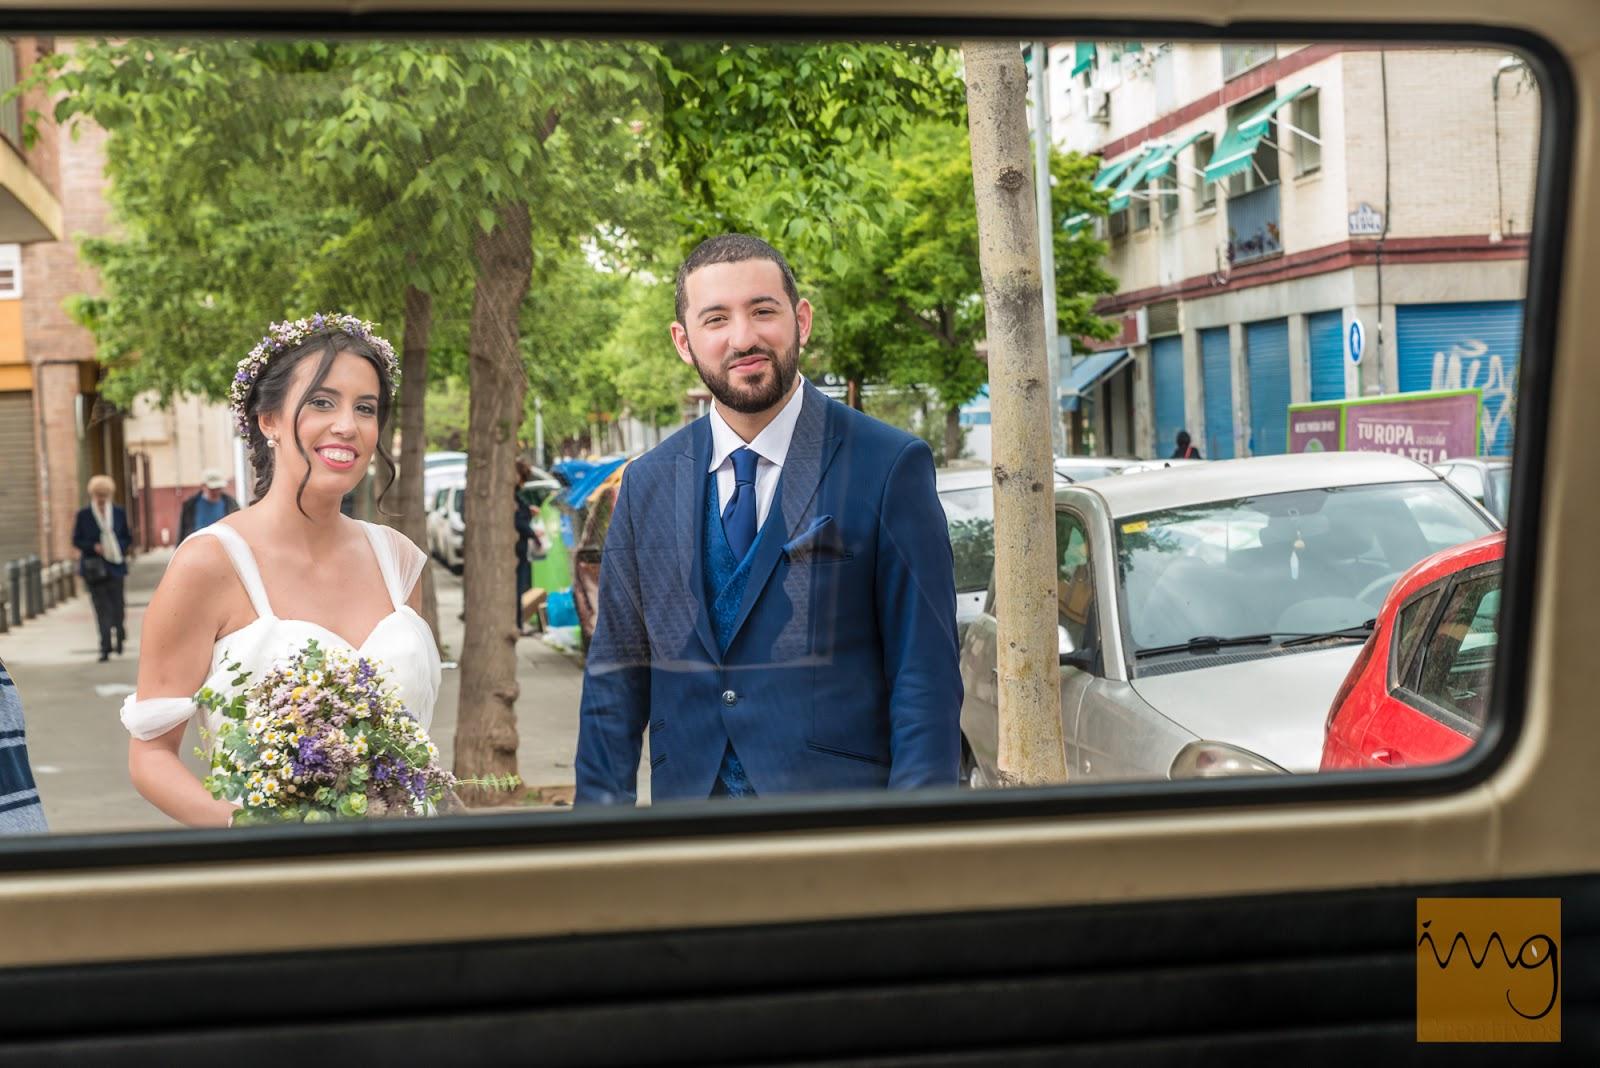 Fotografía de boda a través del cristal